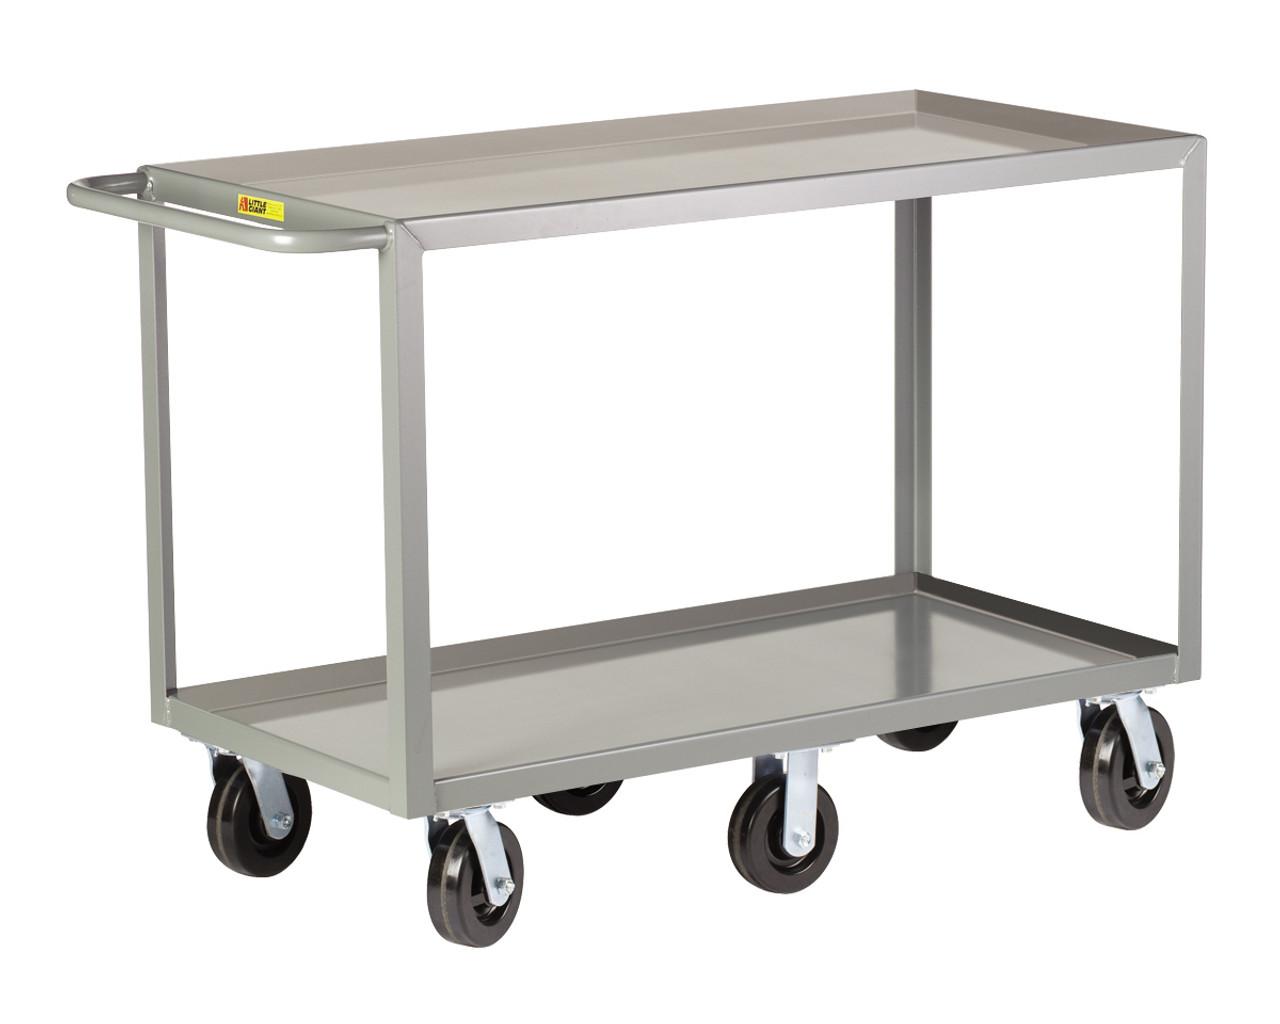 6 Wheeled Heavy Duty Shelf Trucks